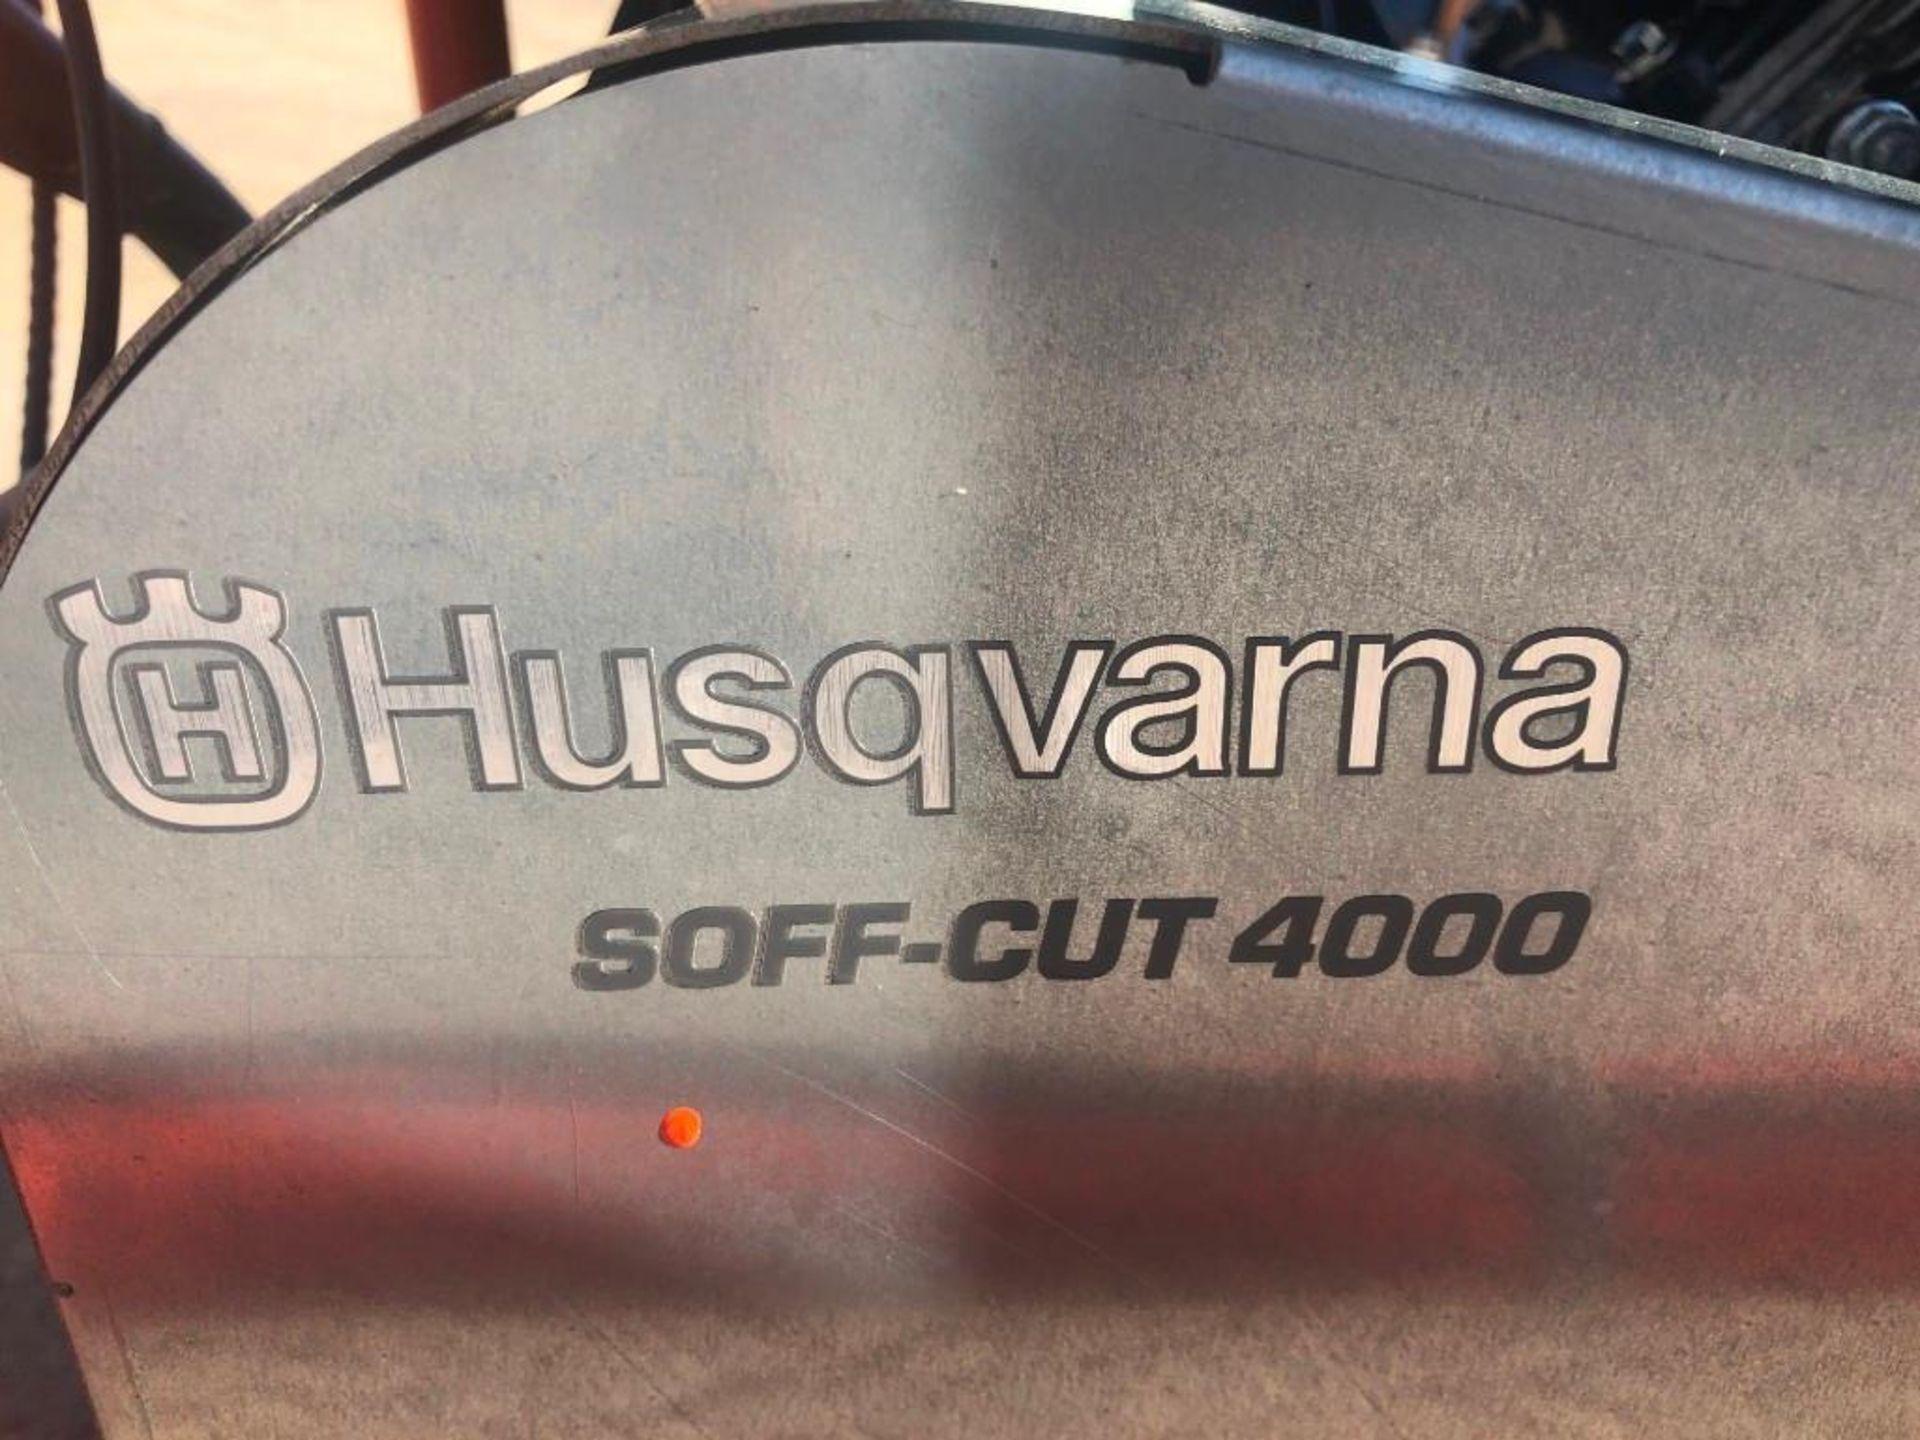 Lot 109 - Husqvarna 20HP X4000 Soff Cut Saw with Vac Port, 4 Hours, Model Soff-Cut 4000, Kohler Command Pro